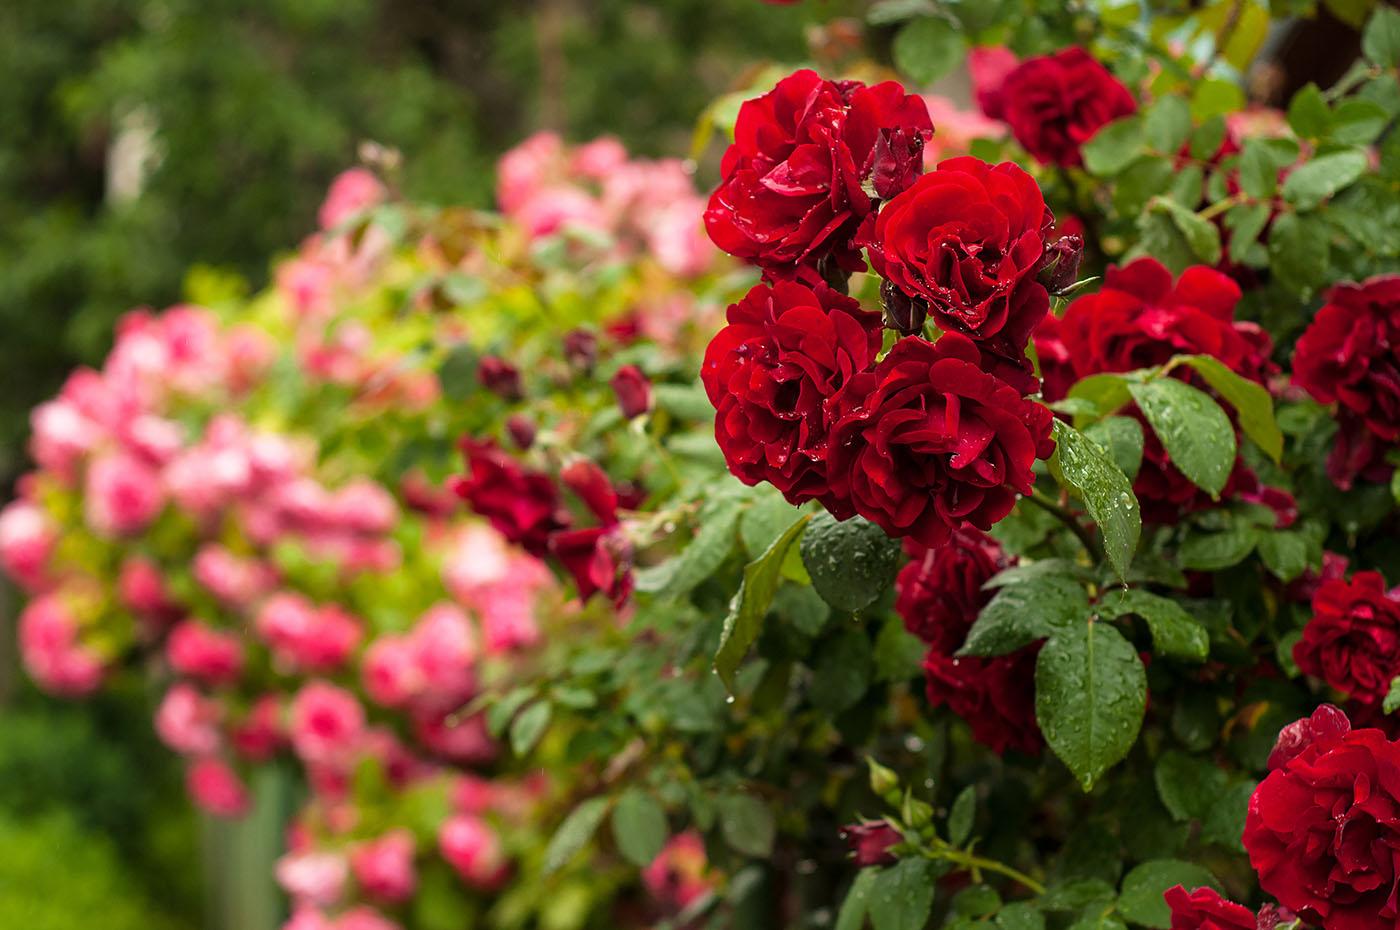 Horpestad Plantesalg * Hageroser - Rosebusker